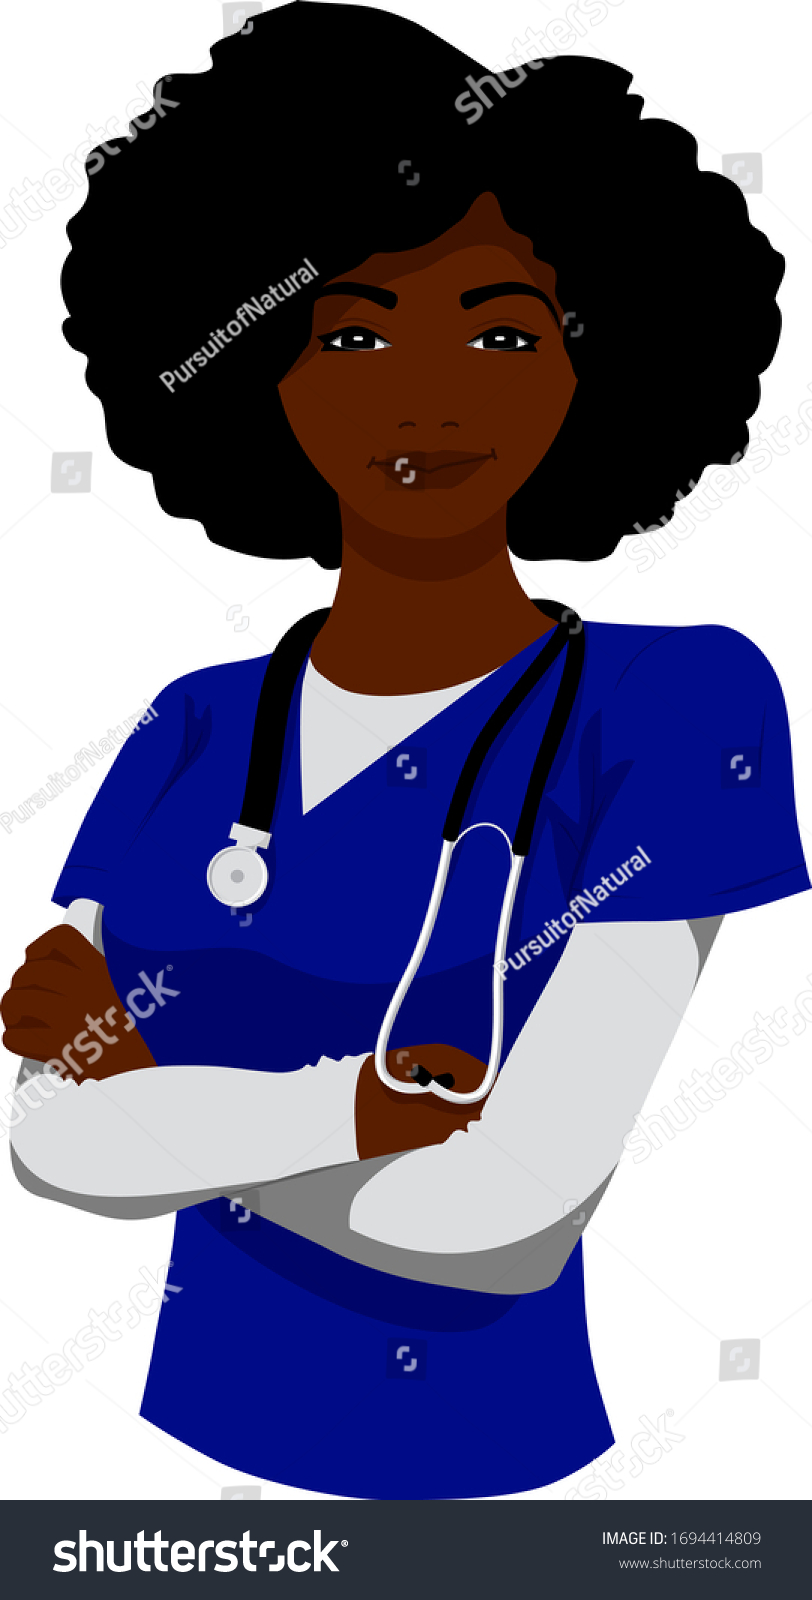 Embroidery Nurse Stethoscope Heart heartbeat Queen African Black woman legs Design Machine Nurses quarantine healthy lifestyle beauty health